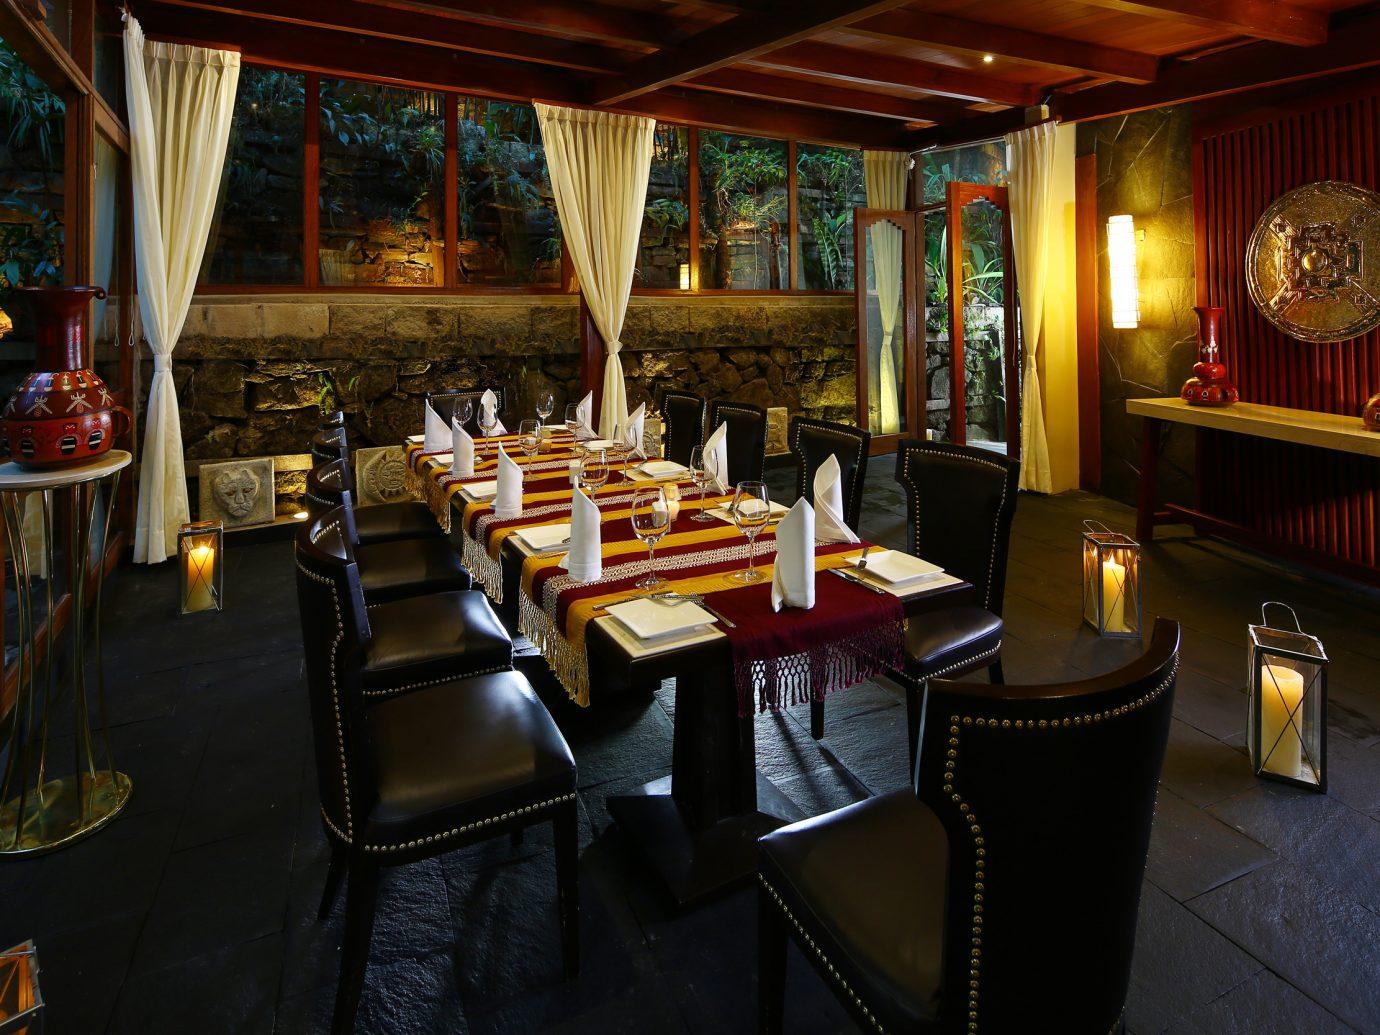 Qunuq Restaurant Terrace at SUMAQ Machu Picchu